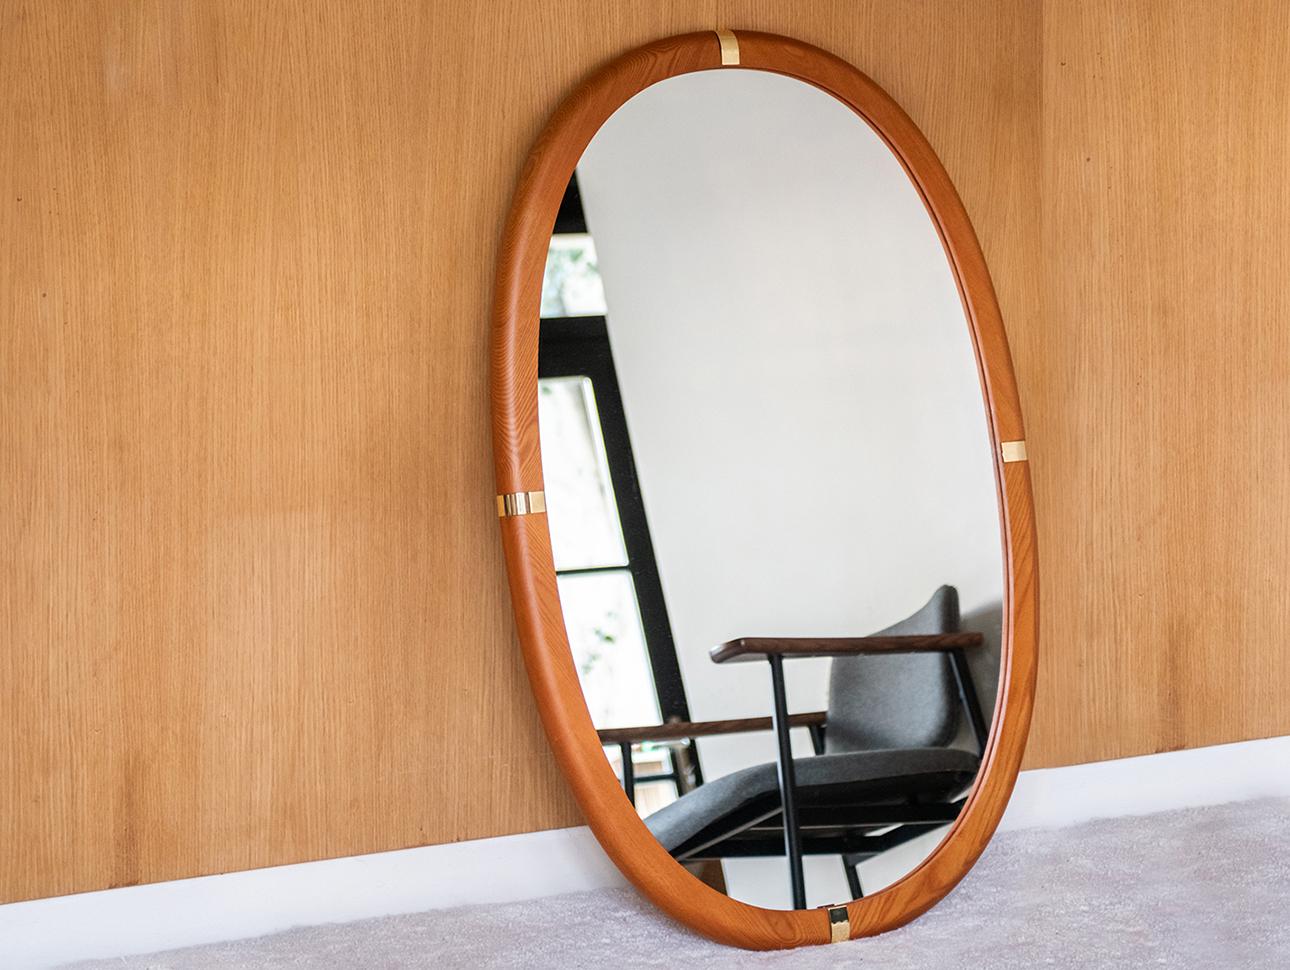 Our Marcello Mirrors